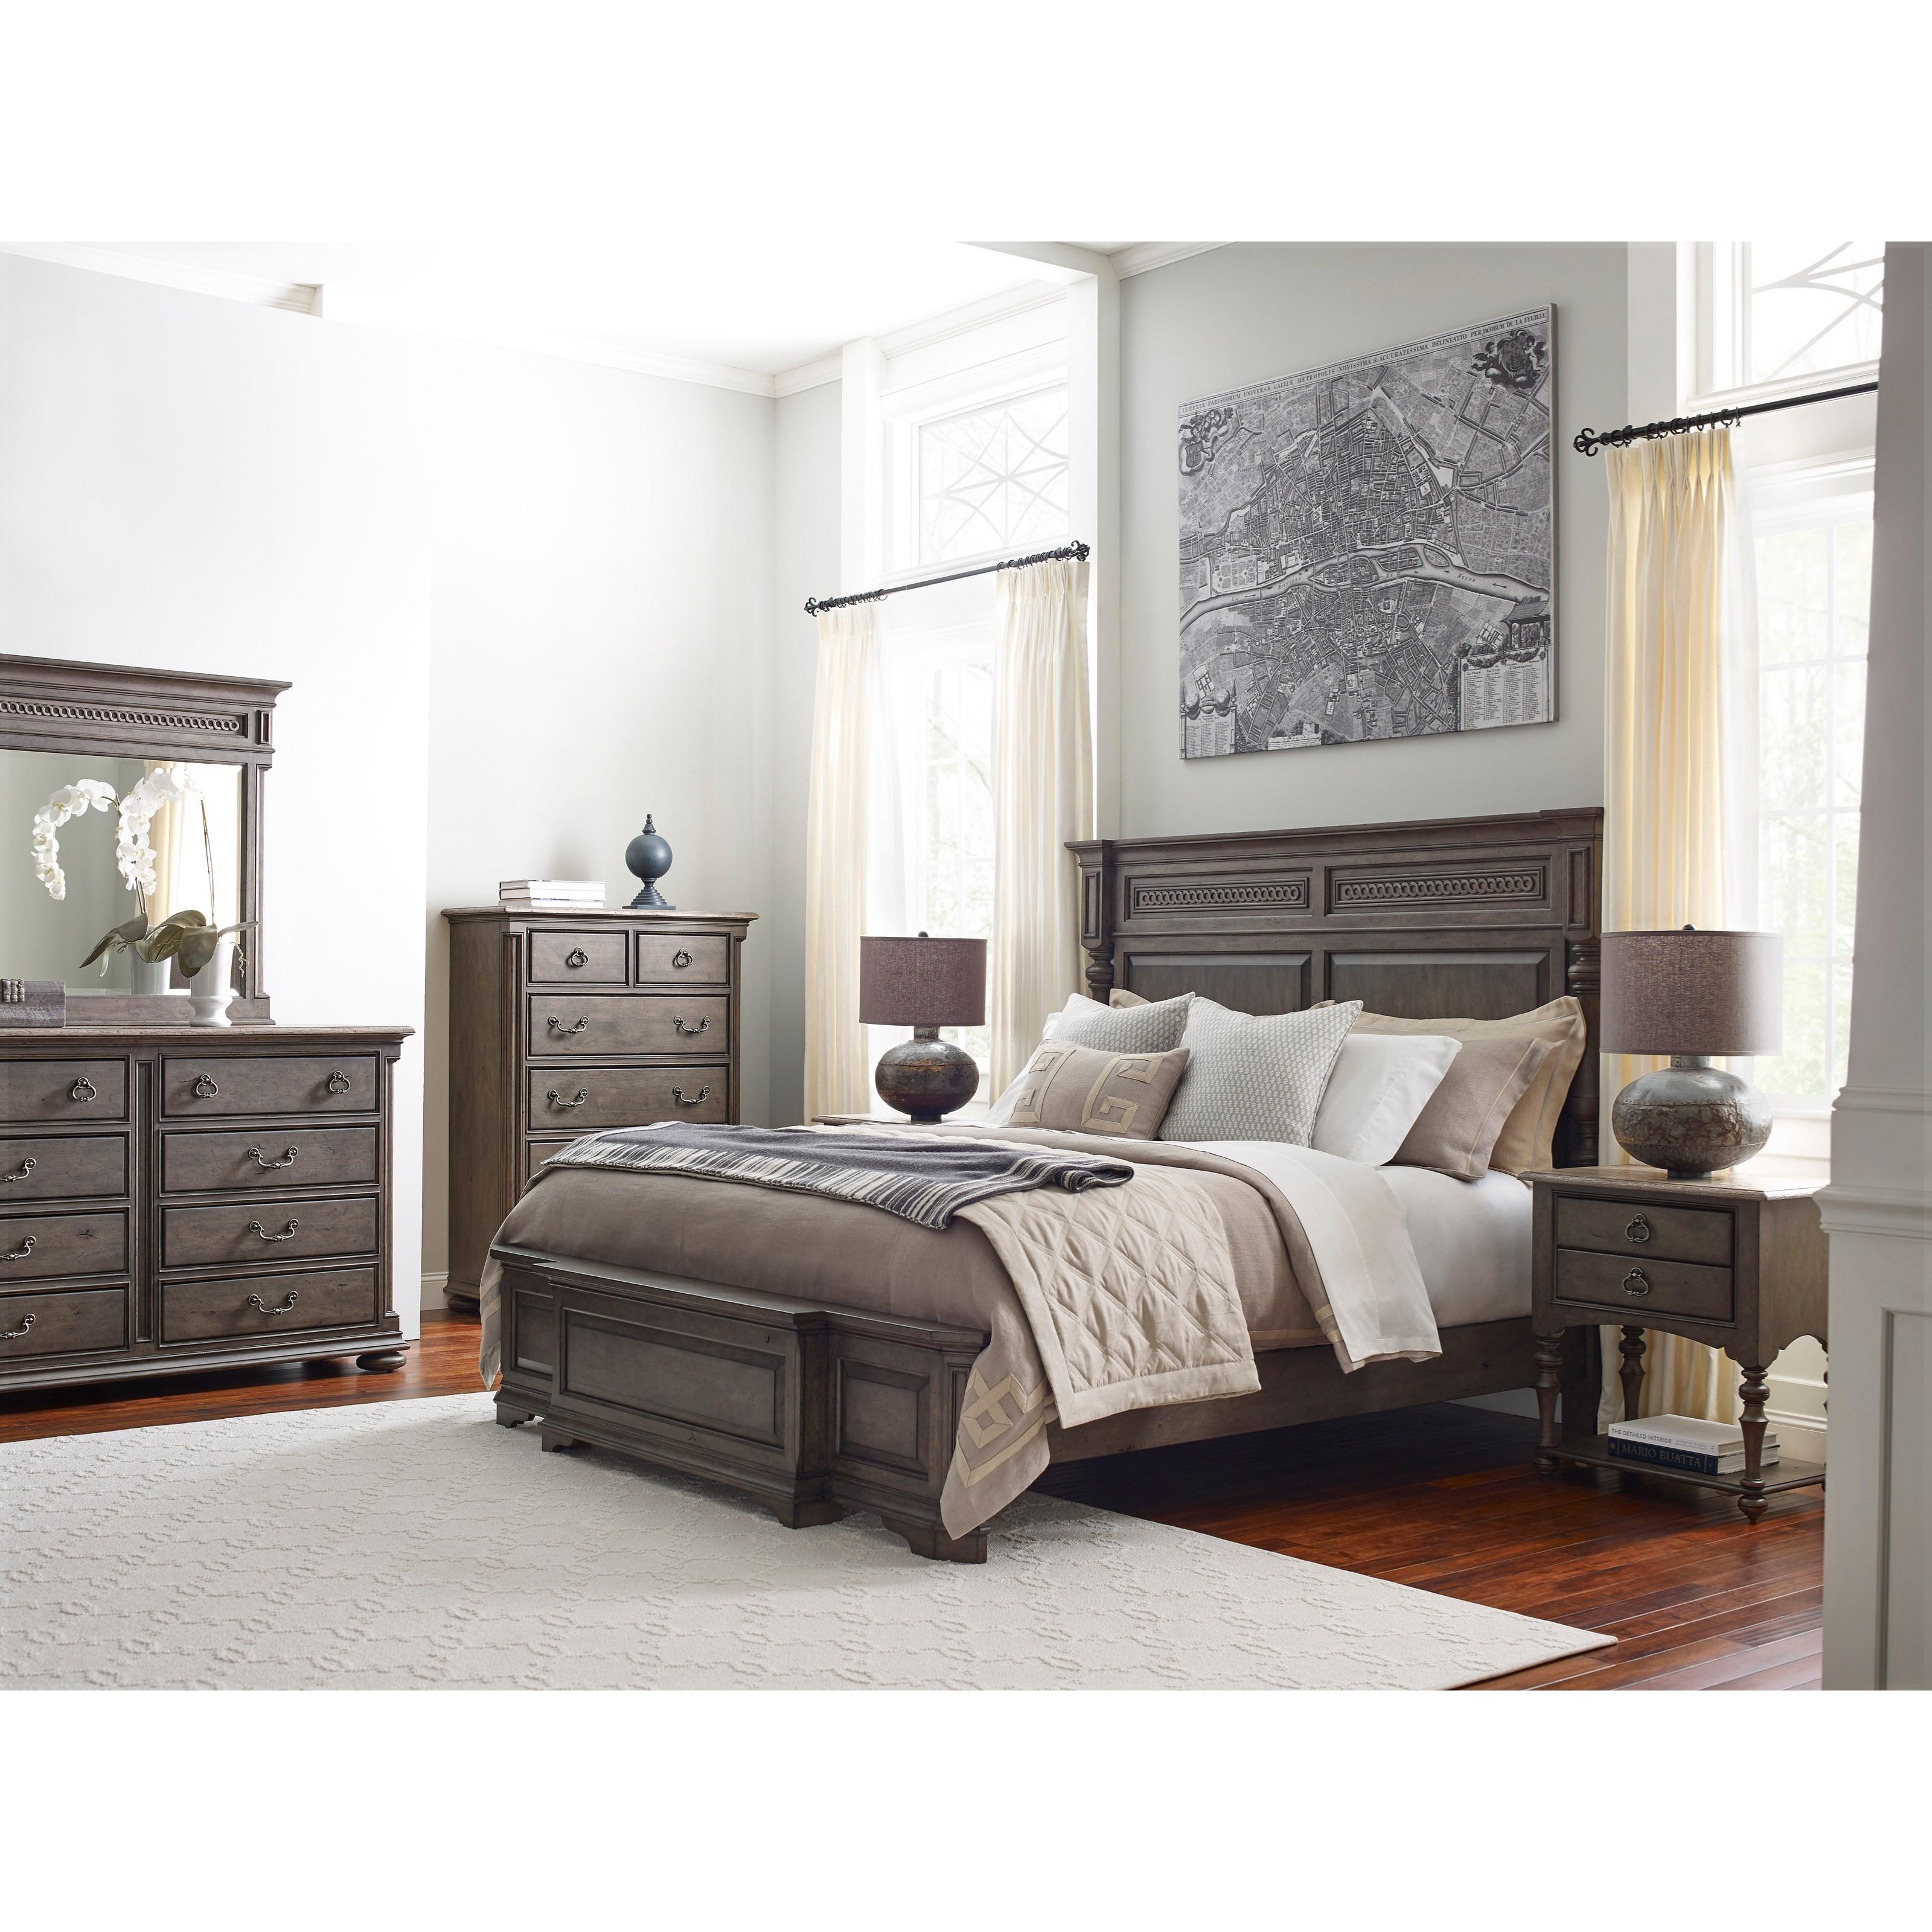 Kincaid Furniture Greyson King Bedroom Group - Item Number: 608 K Bedroom  Group 1